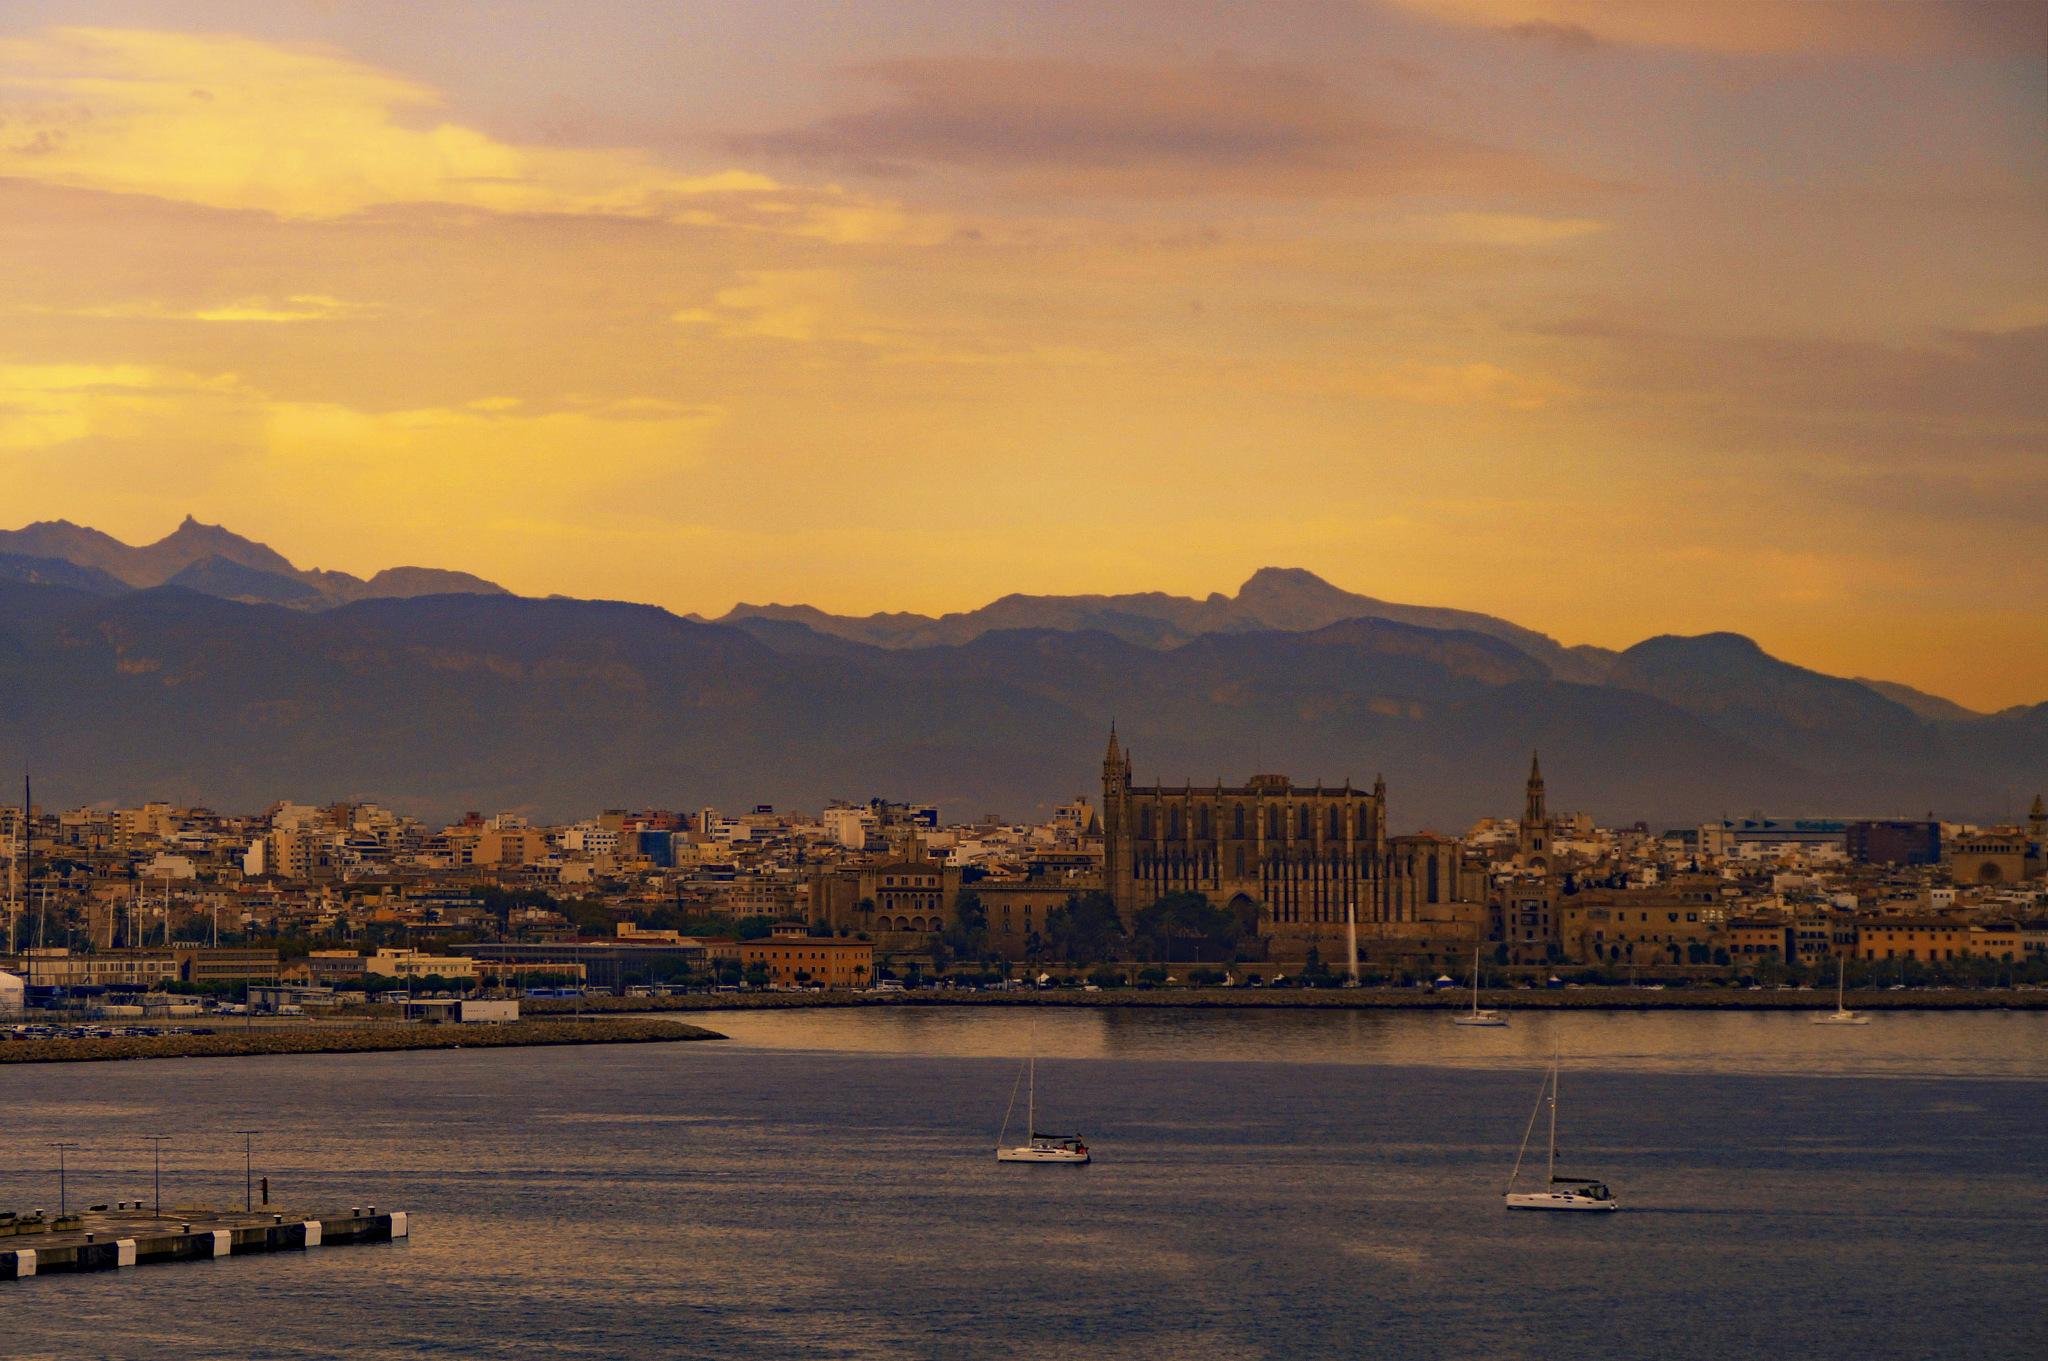 Palma de Mallorca by Frank Schmidt